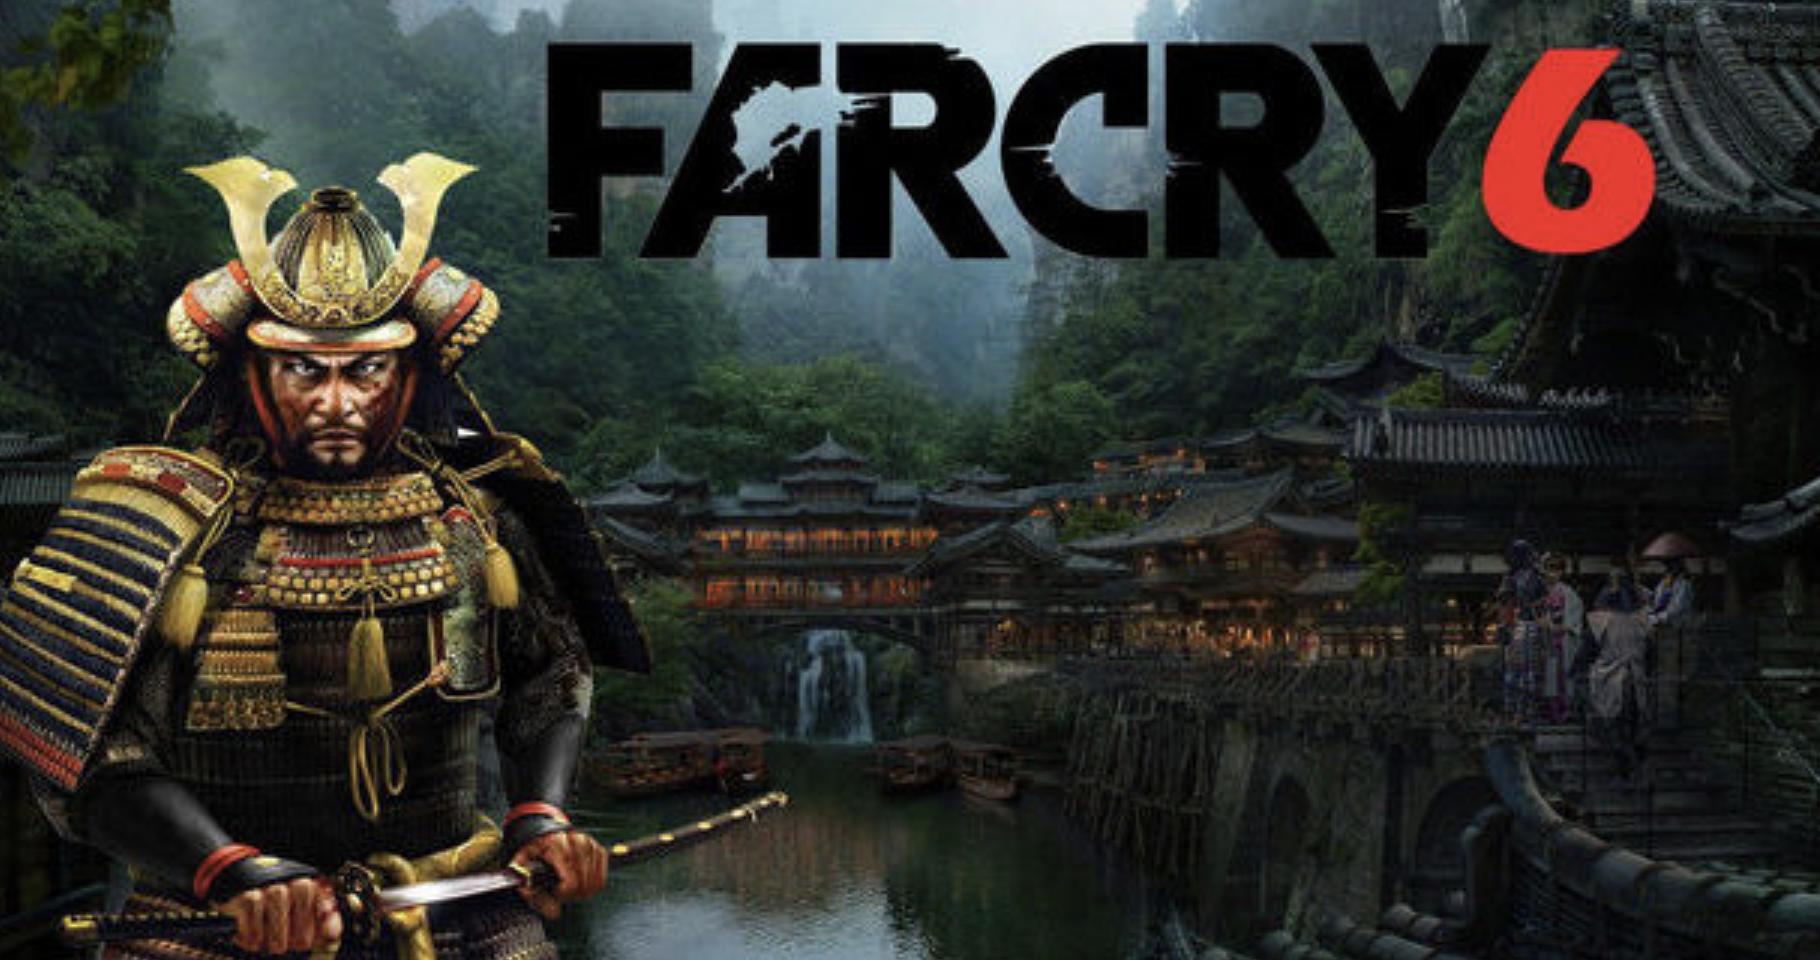 Far Cry 6 Release Date in 2021